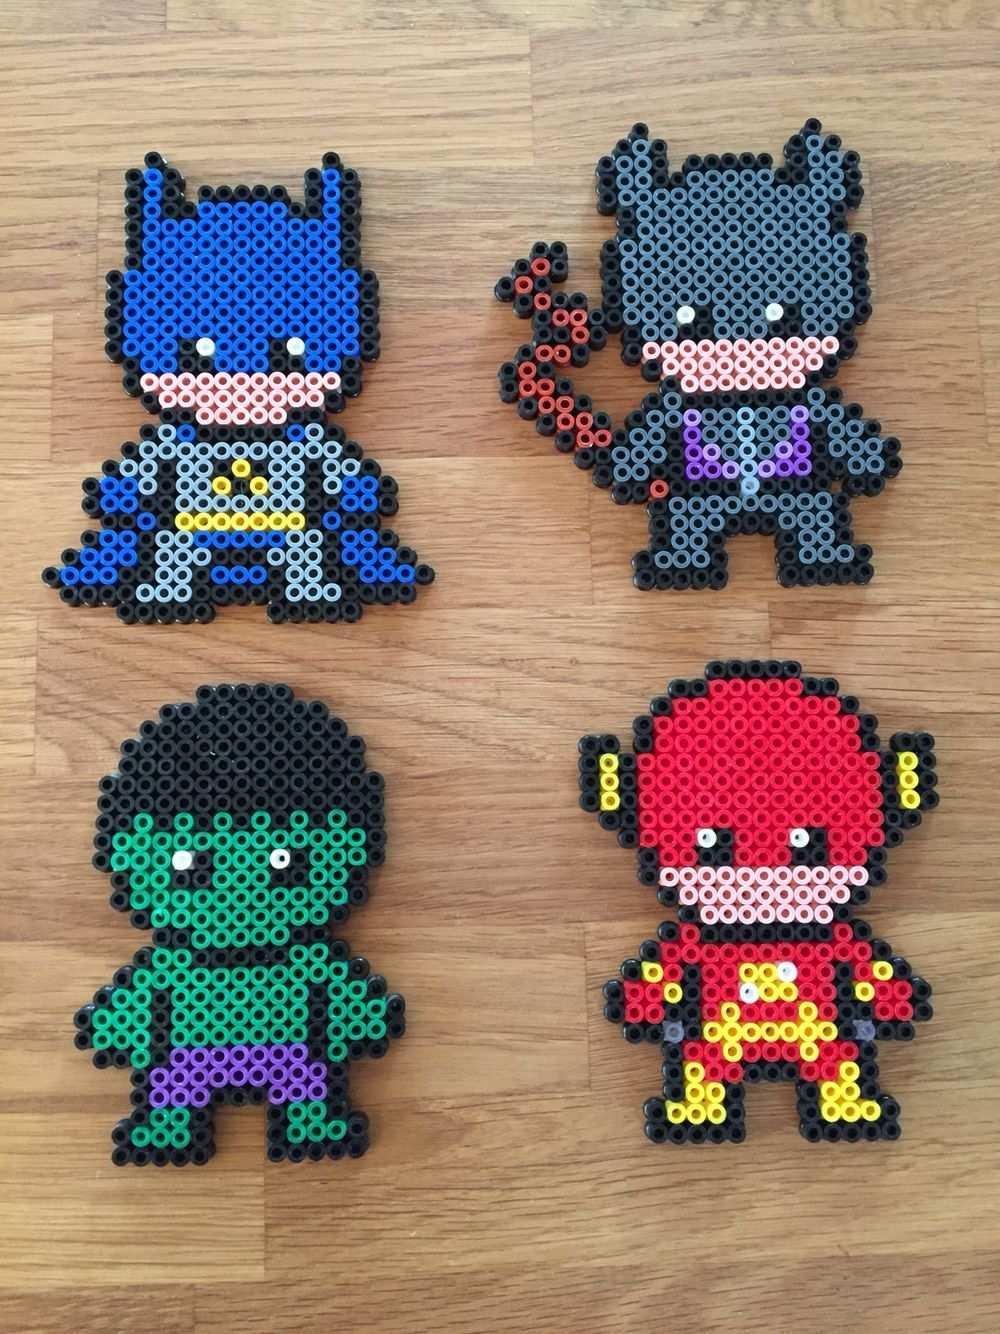 Batman Catwoman Hulk Flash Superheroes Hama Beads Perler Abalorios Hama Plantillas Hama Beads Hama Beads